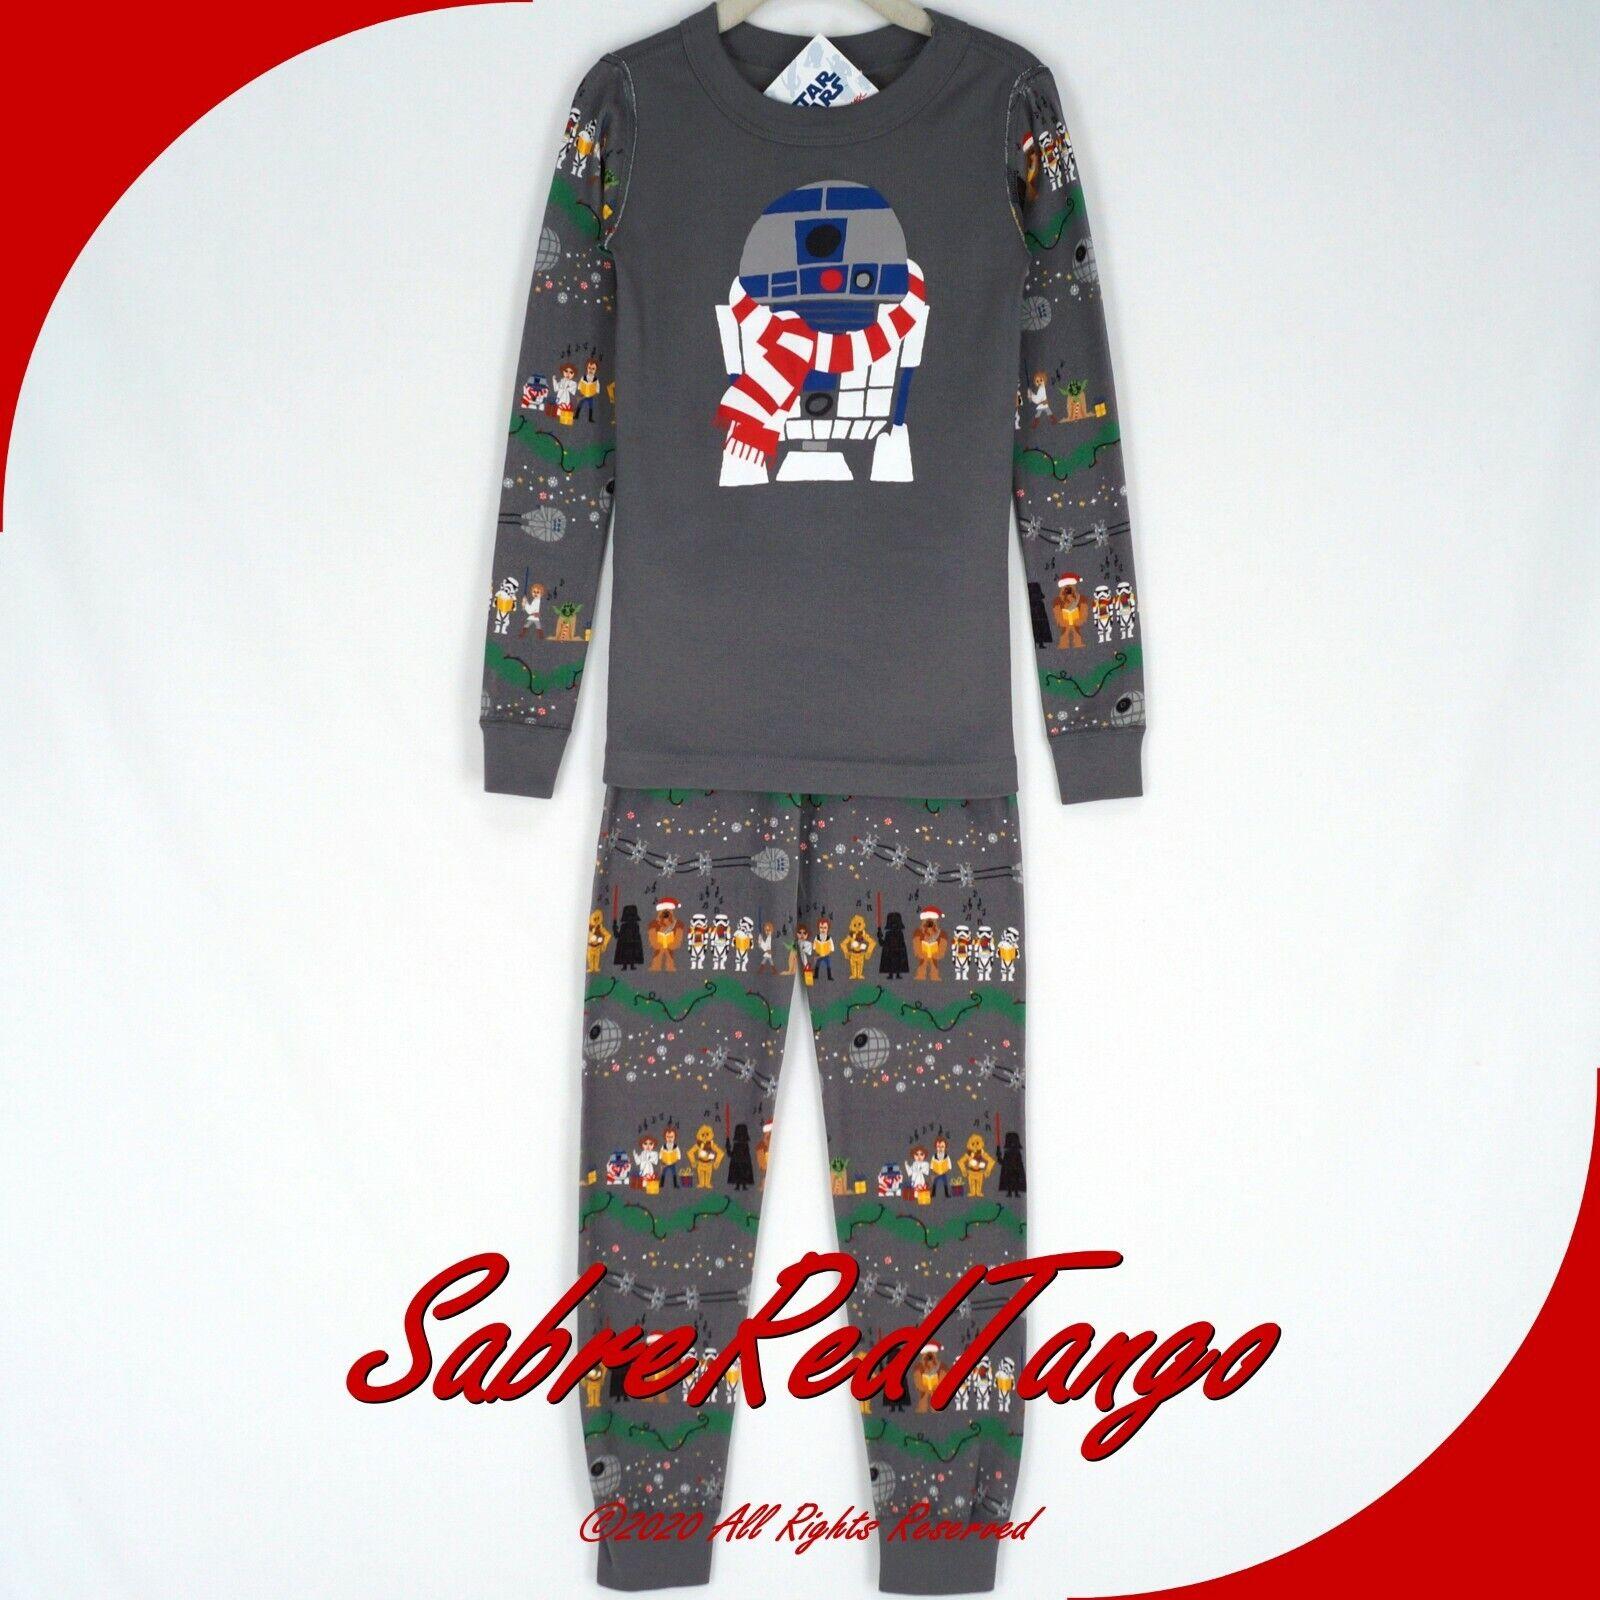 NWT Hanna Andersson Pineapple Organic Cotton Long Johns Pajamas sz 120